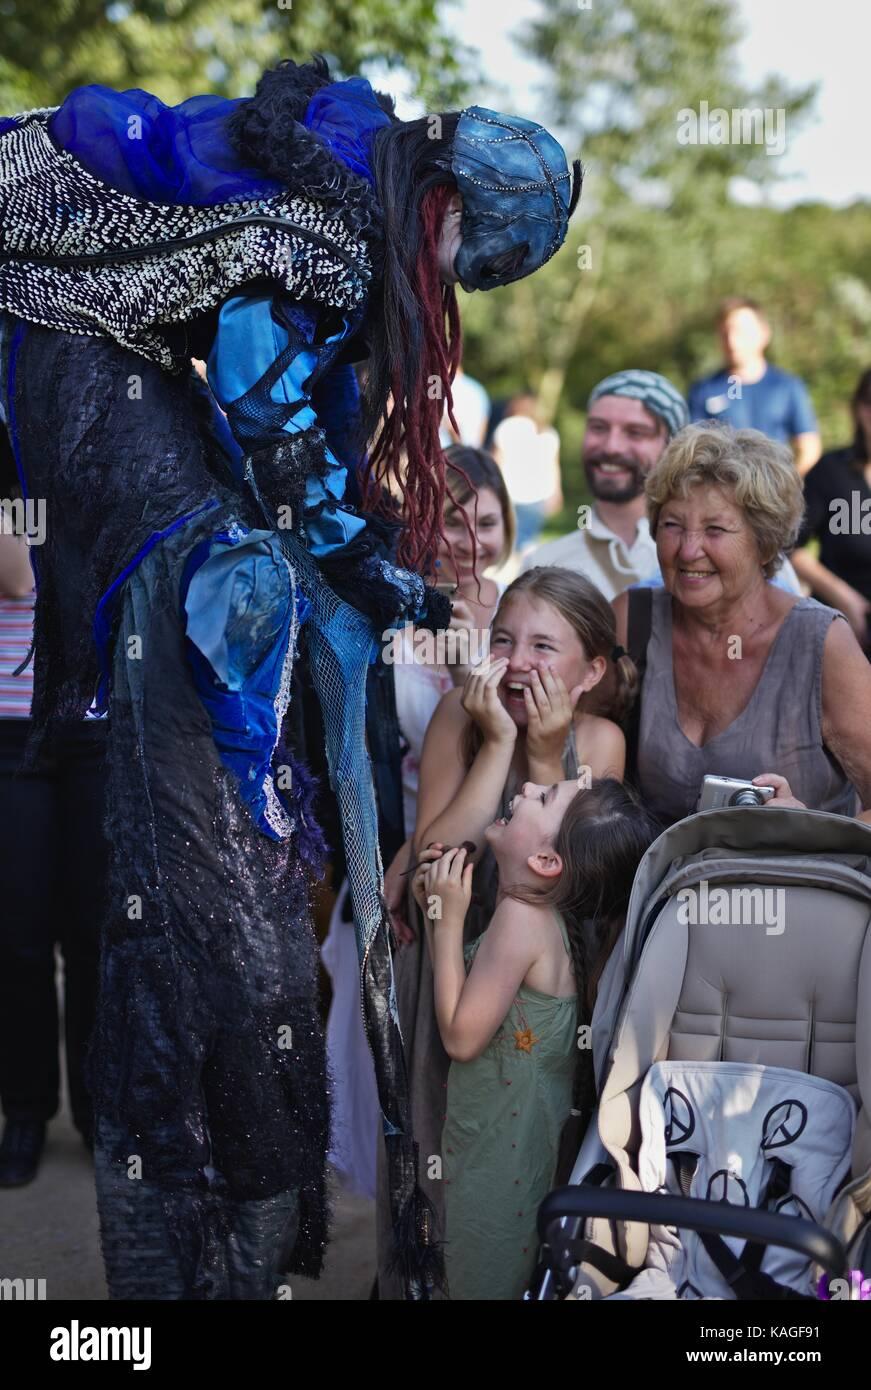 medieval-festival-cologne-KAGF91.jpg